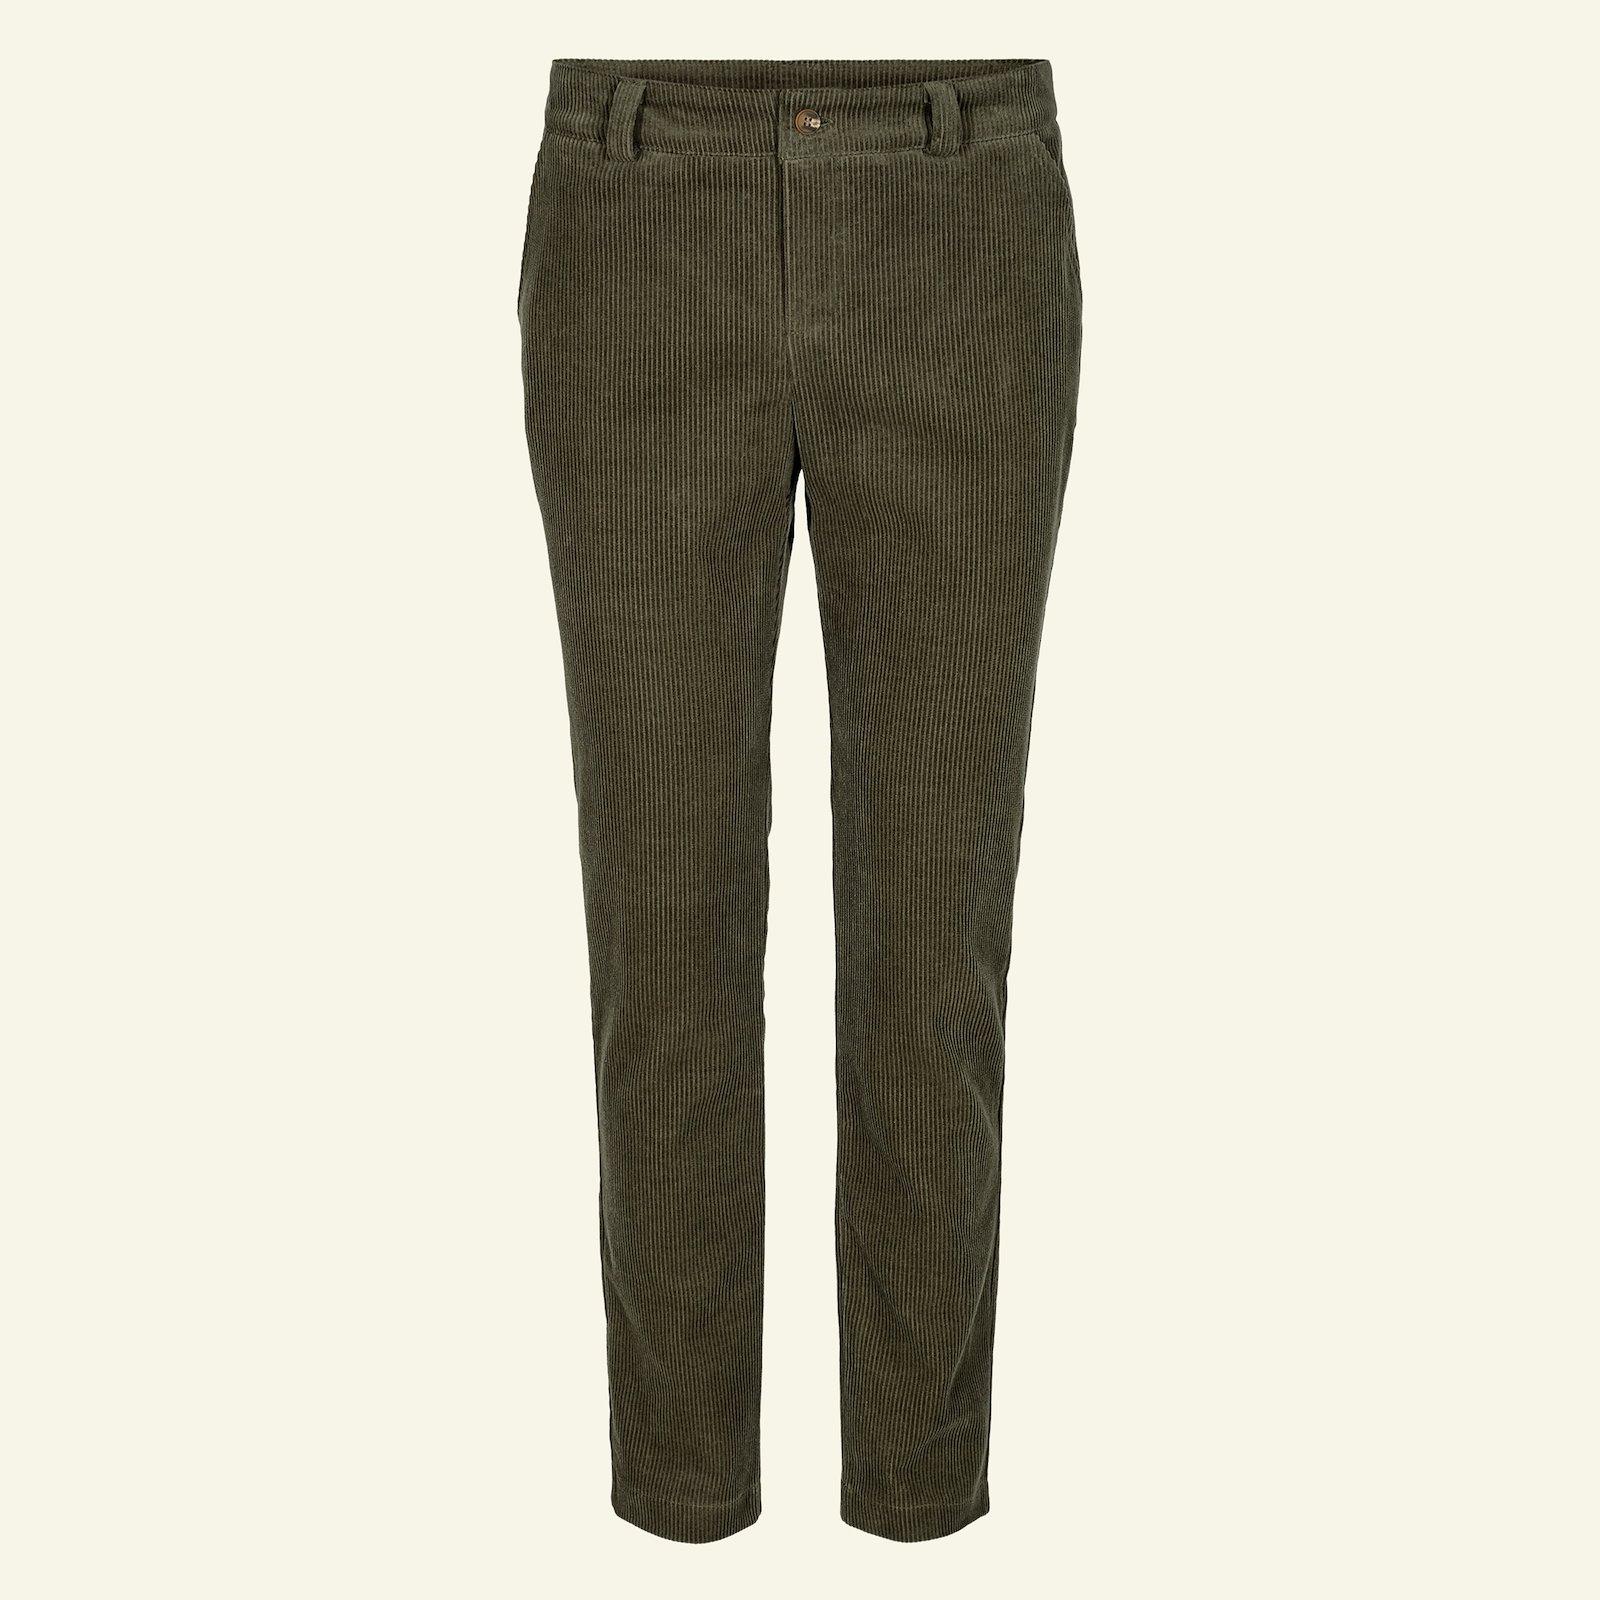 Trousers, 46/18 p20033_430000_sskit